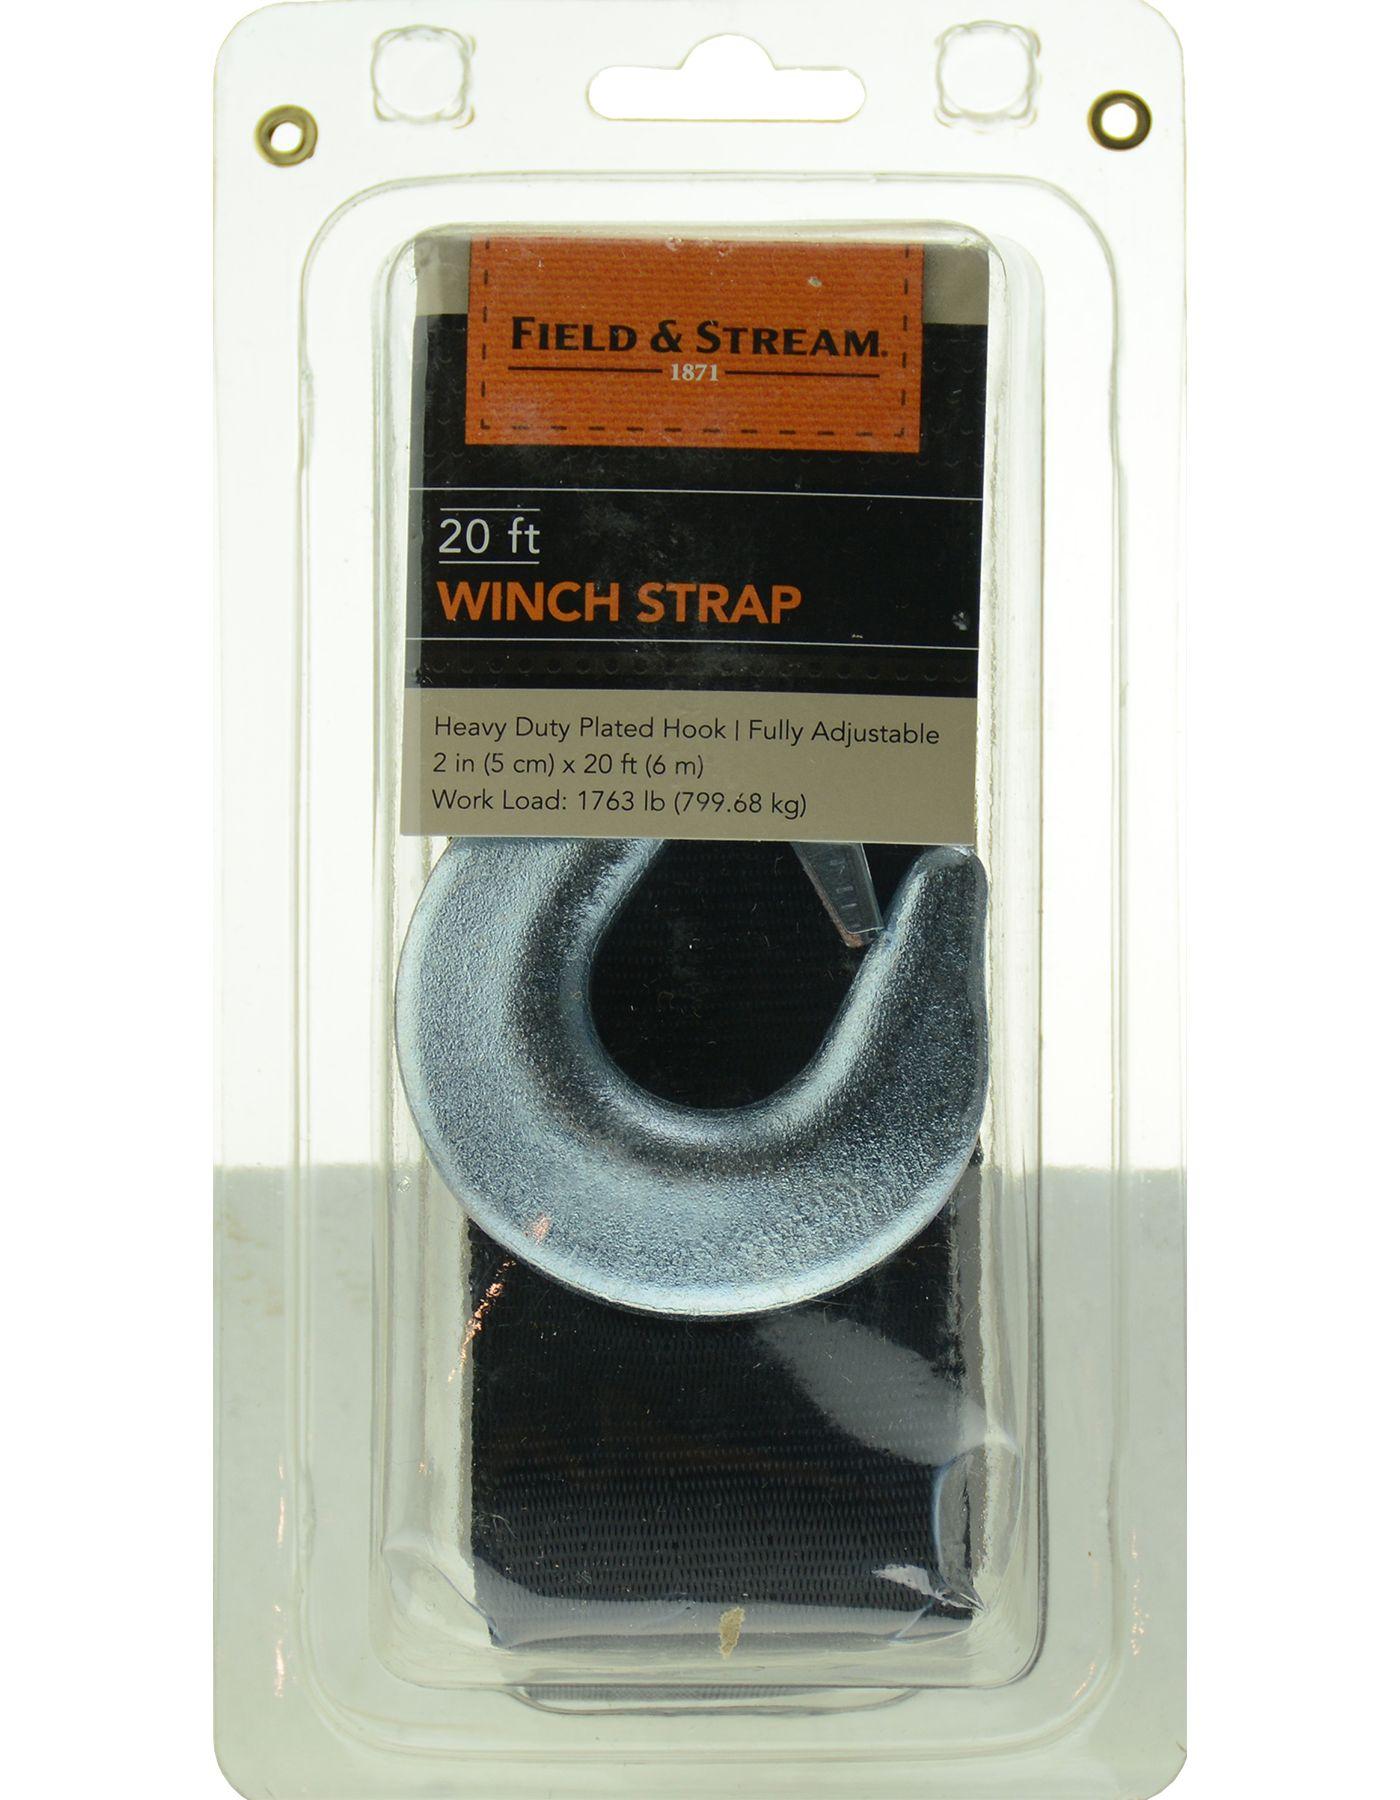 Field & Stream Winch Strap